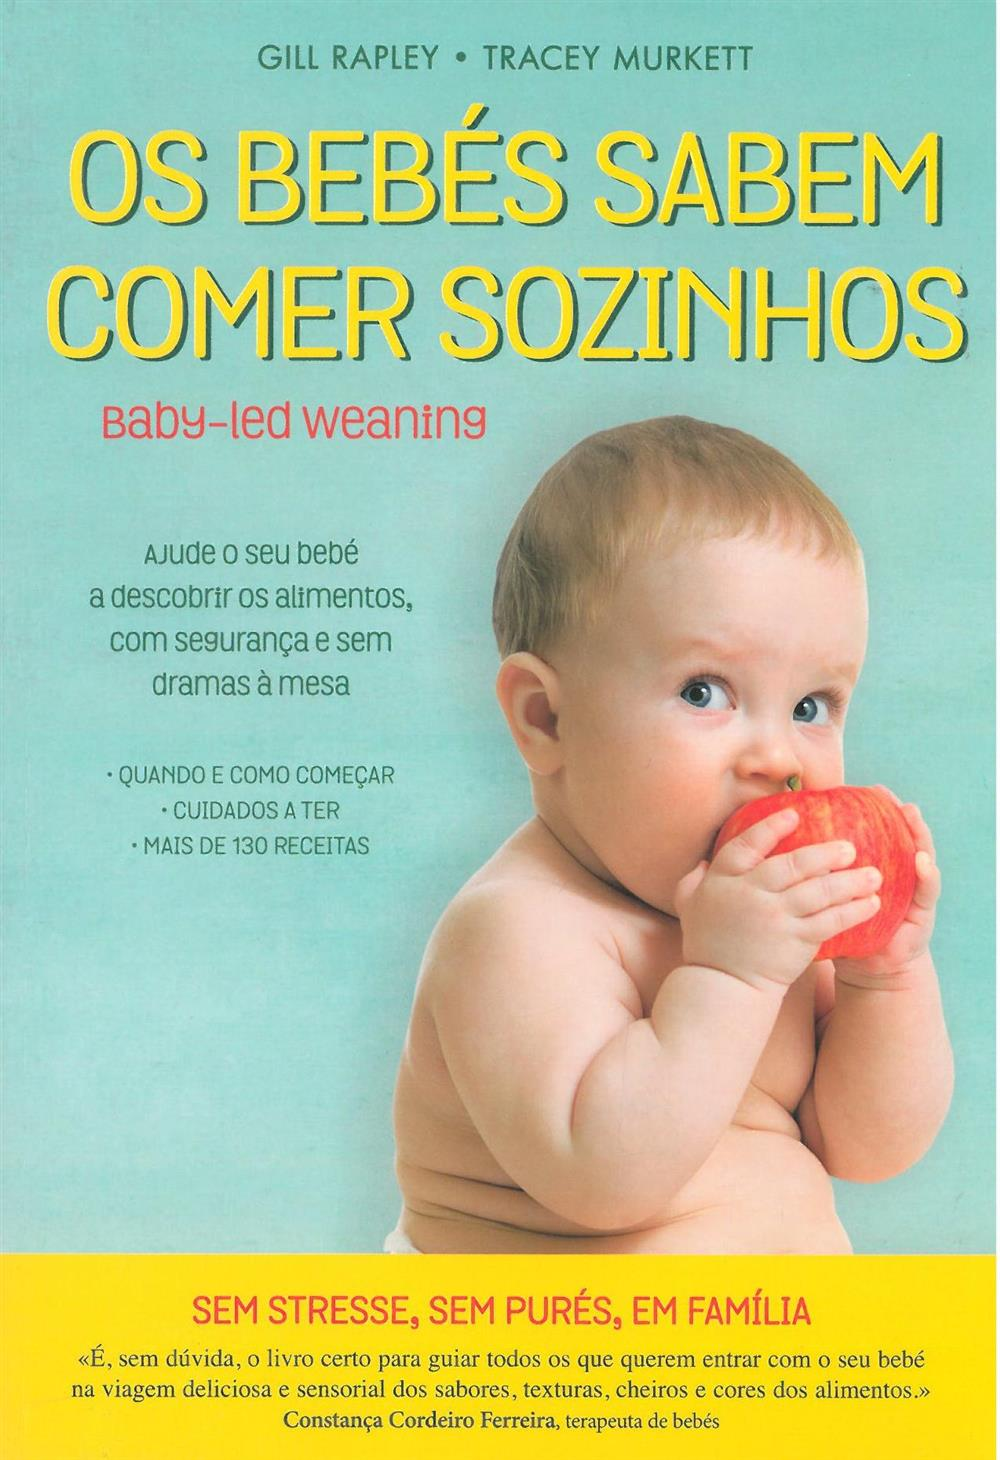 Os bebés sabem comer sozinhos_.jpg